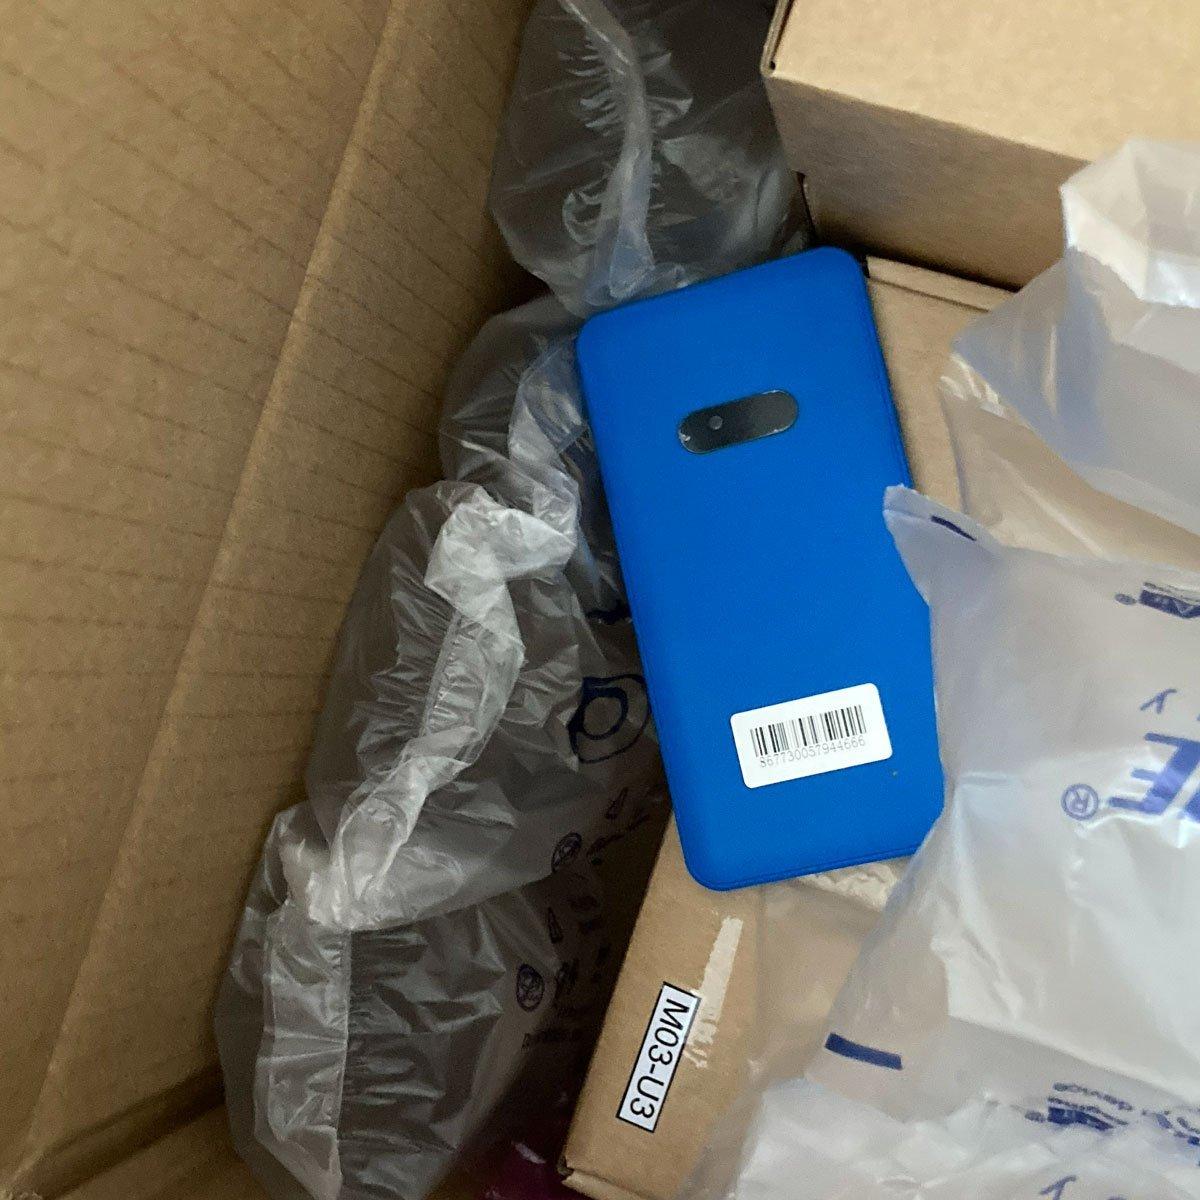 Cold Storage Tracker inside box